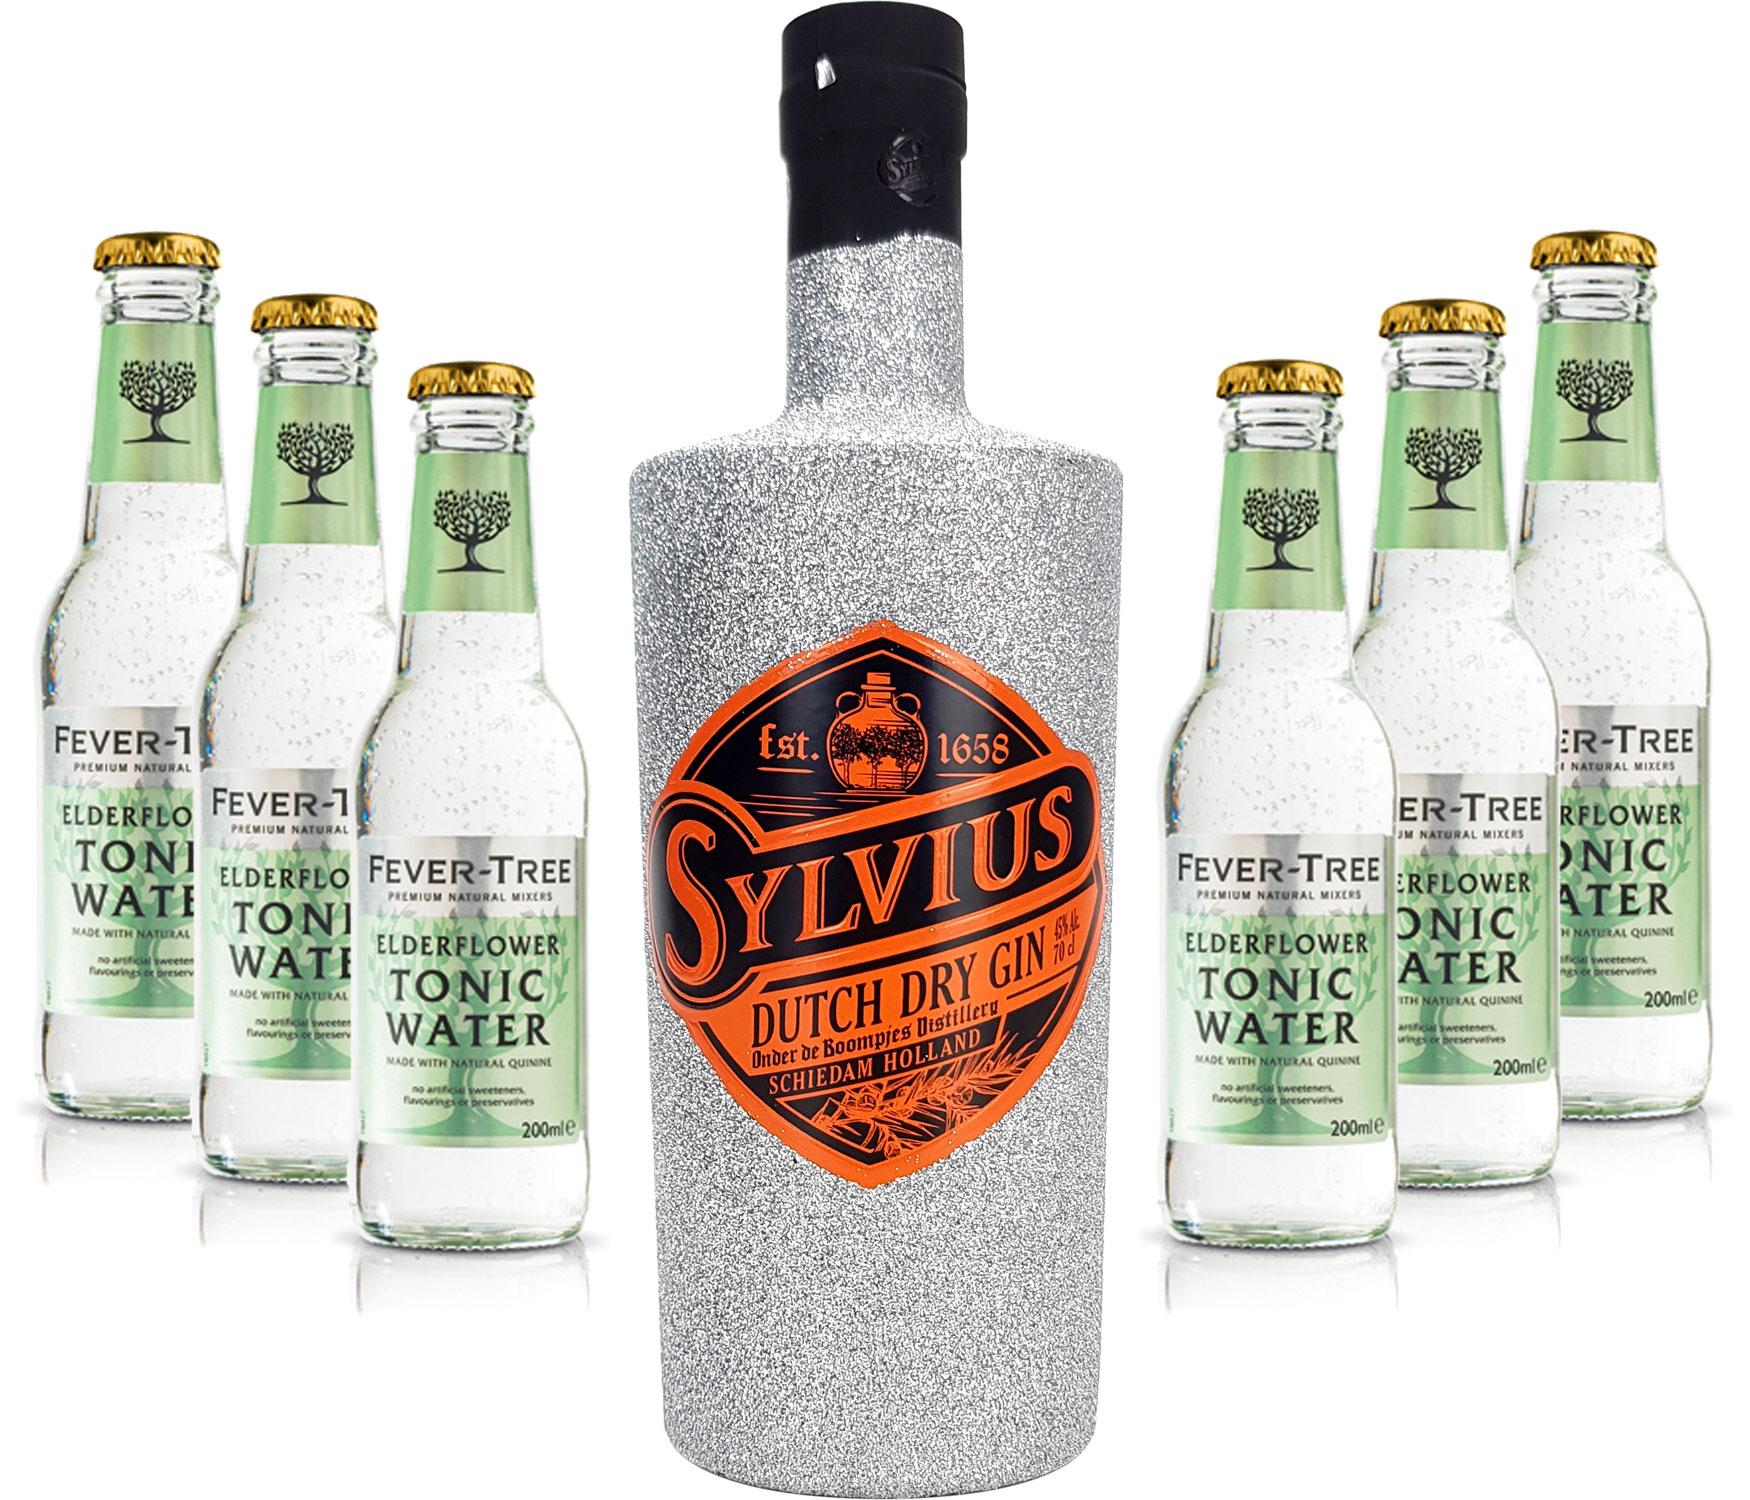 Gin Tonic Bling Bling Silber Glitzer Set Geschenkset - Sylvius Dutch Gin 0,7l 700ml (45% Vol) + 6x Fever Tree Elderflower Tonic Water 200ml inkl. Pfand MEHRWEG -[Enthält Sulfite]